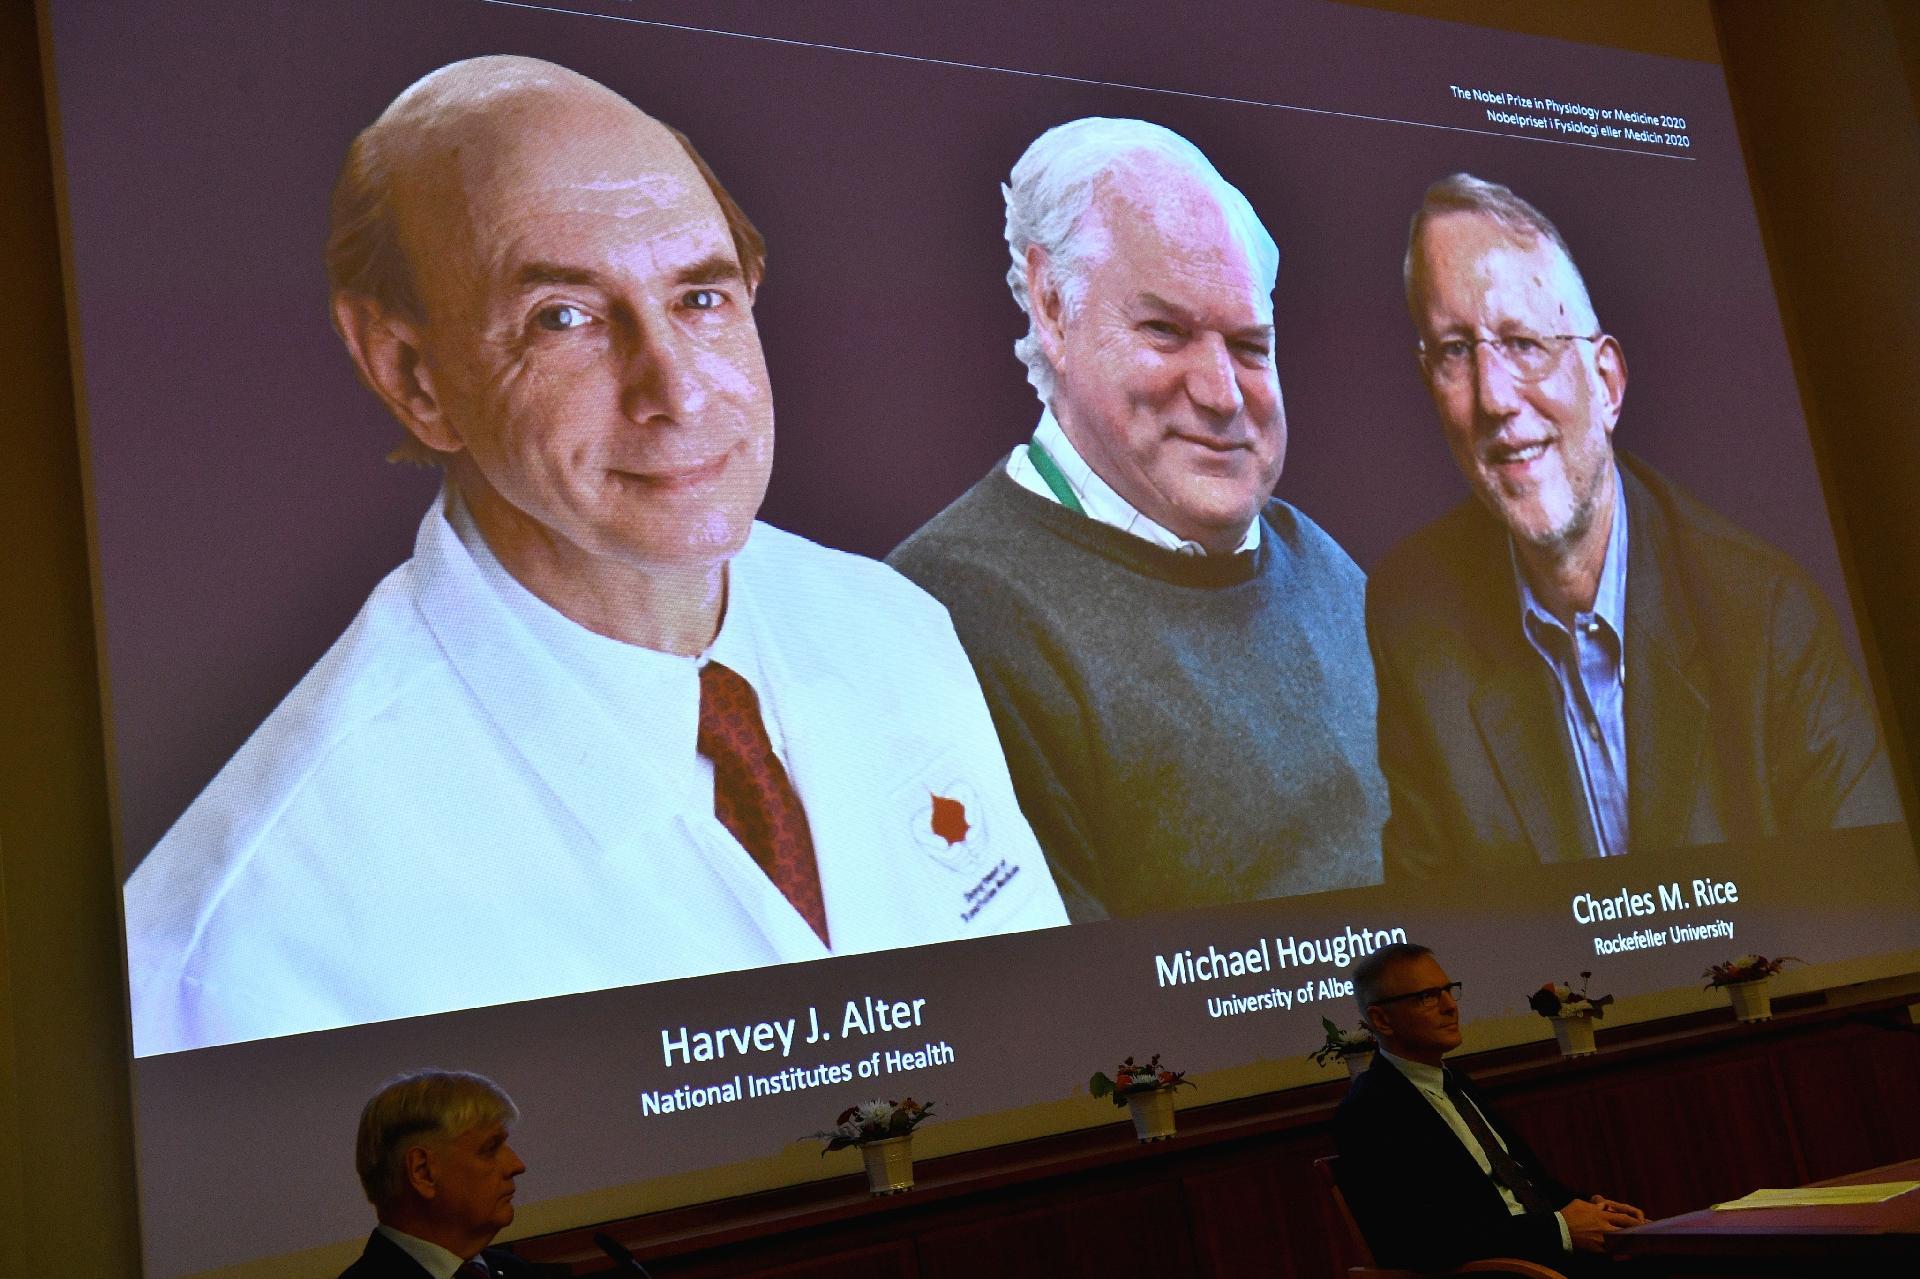 Prêmio Nobel de Medicina de 2020 premia Harvey J. Alter, Michael Houghton e  Charles M. Rice por descoberta do vírus da hepatite C